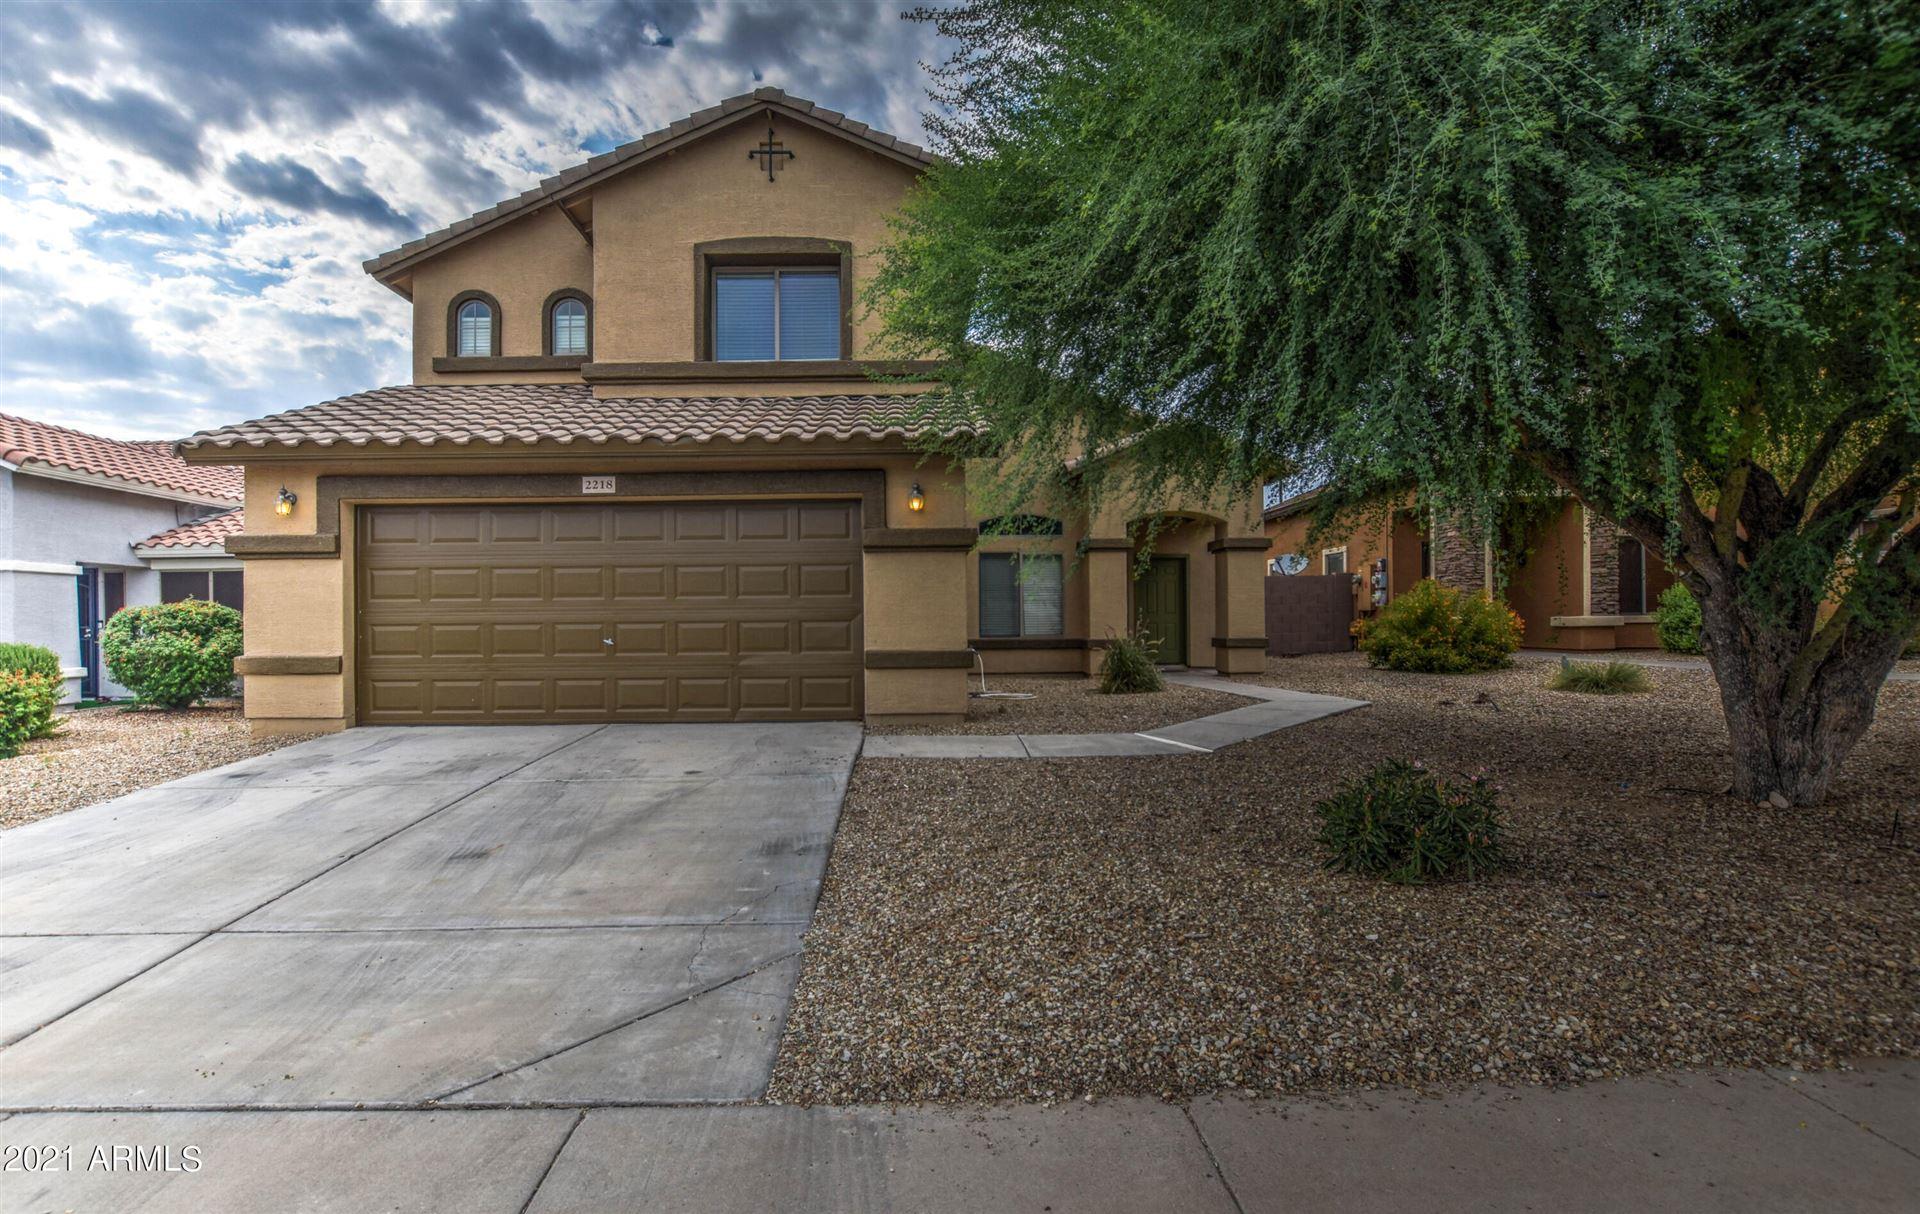 Photo of 2218 S 258TH Avenue, Buckeye, AZ 85326 (MLS # 6293055)